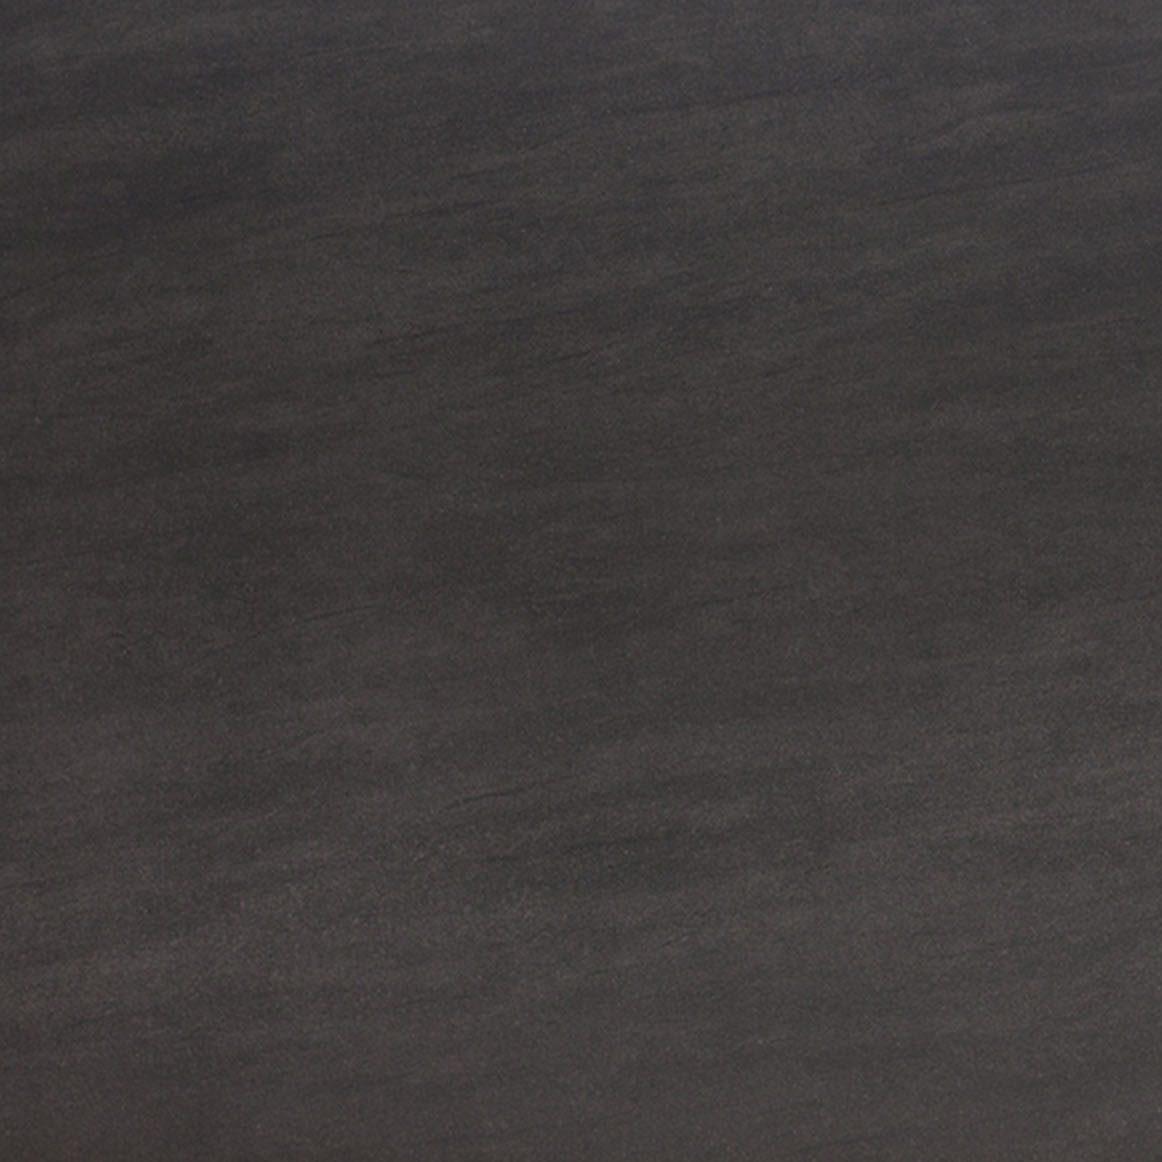 Neolith Basalt Black Marble Trend Marble Granite